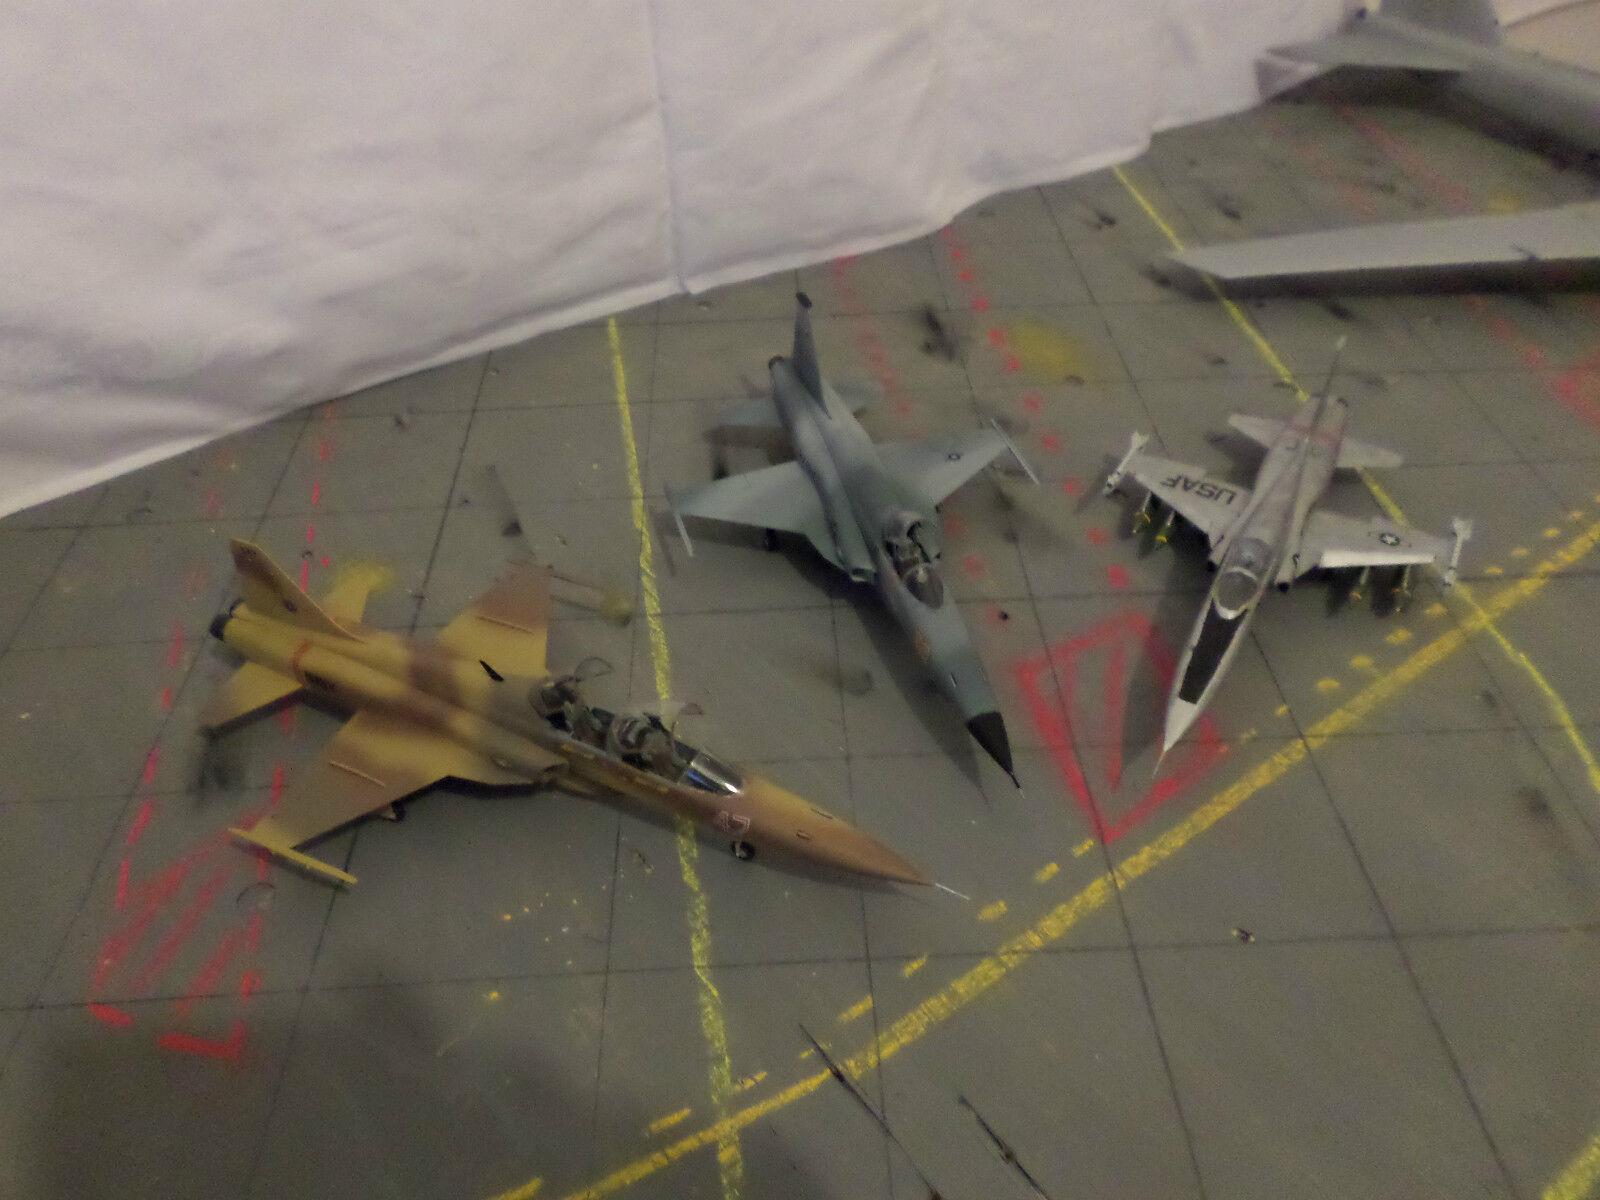 Northrop f-5 Freedom Fighter/Tiger II Aerei Modello in scala 1:48